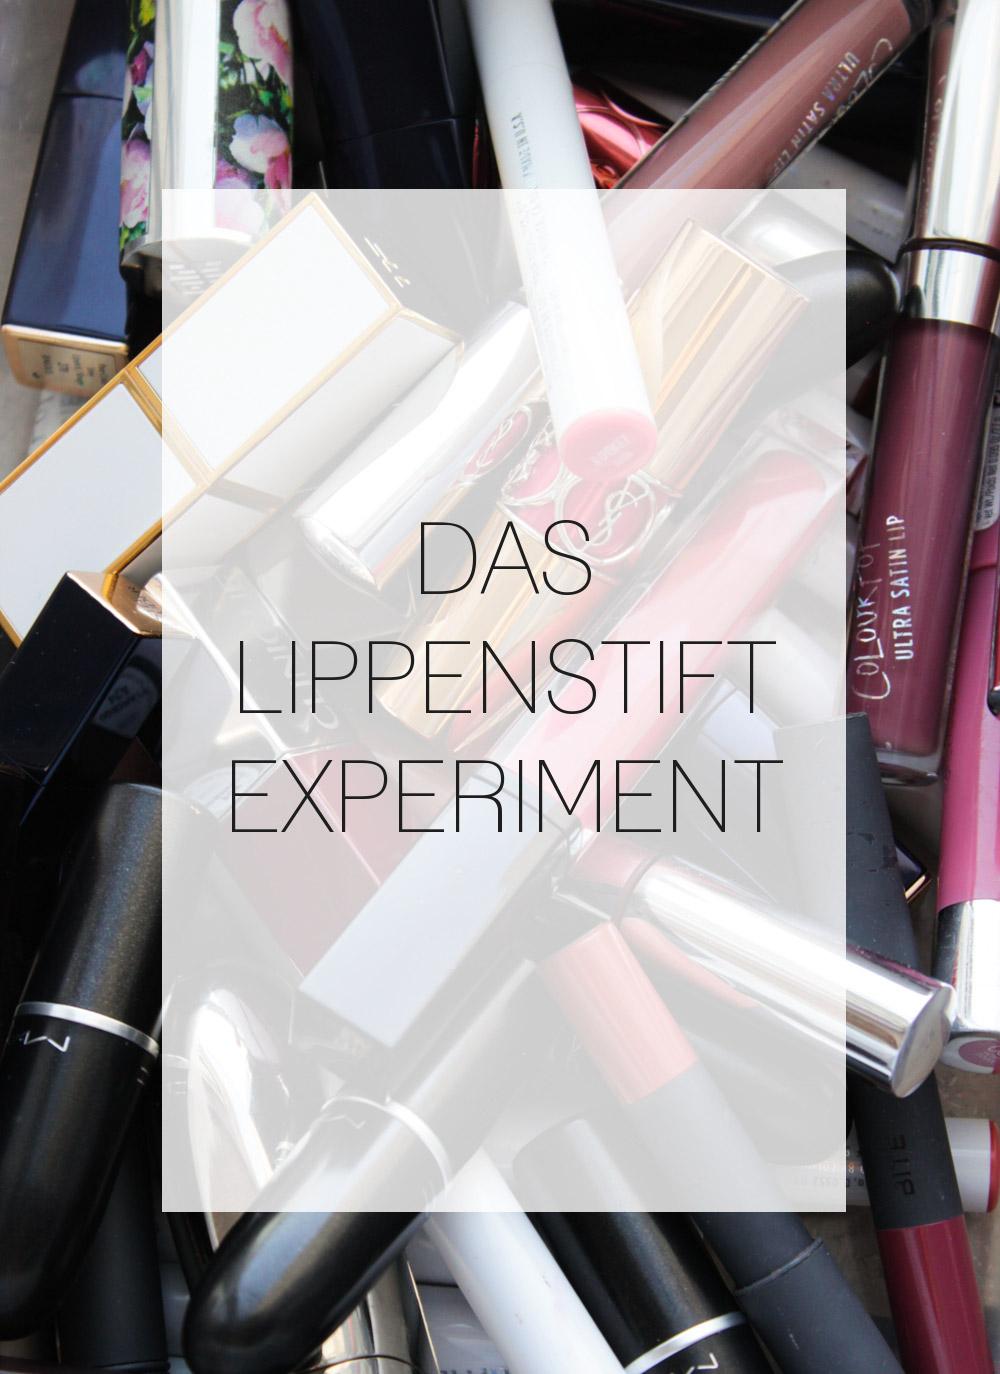 lippenstifte experiment